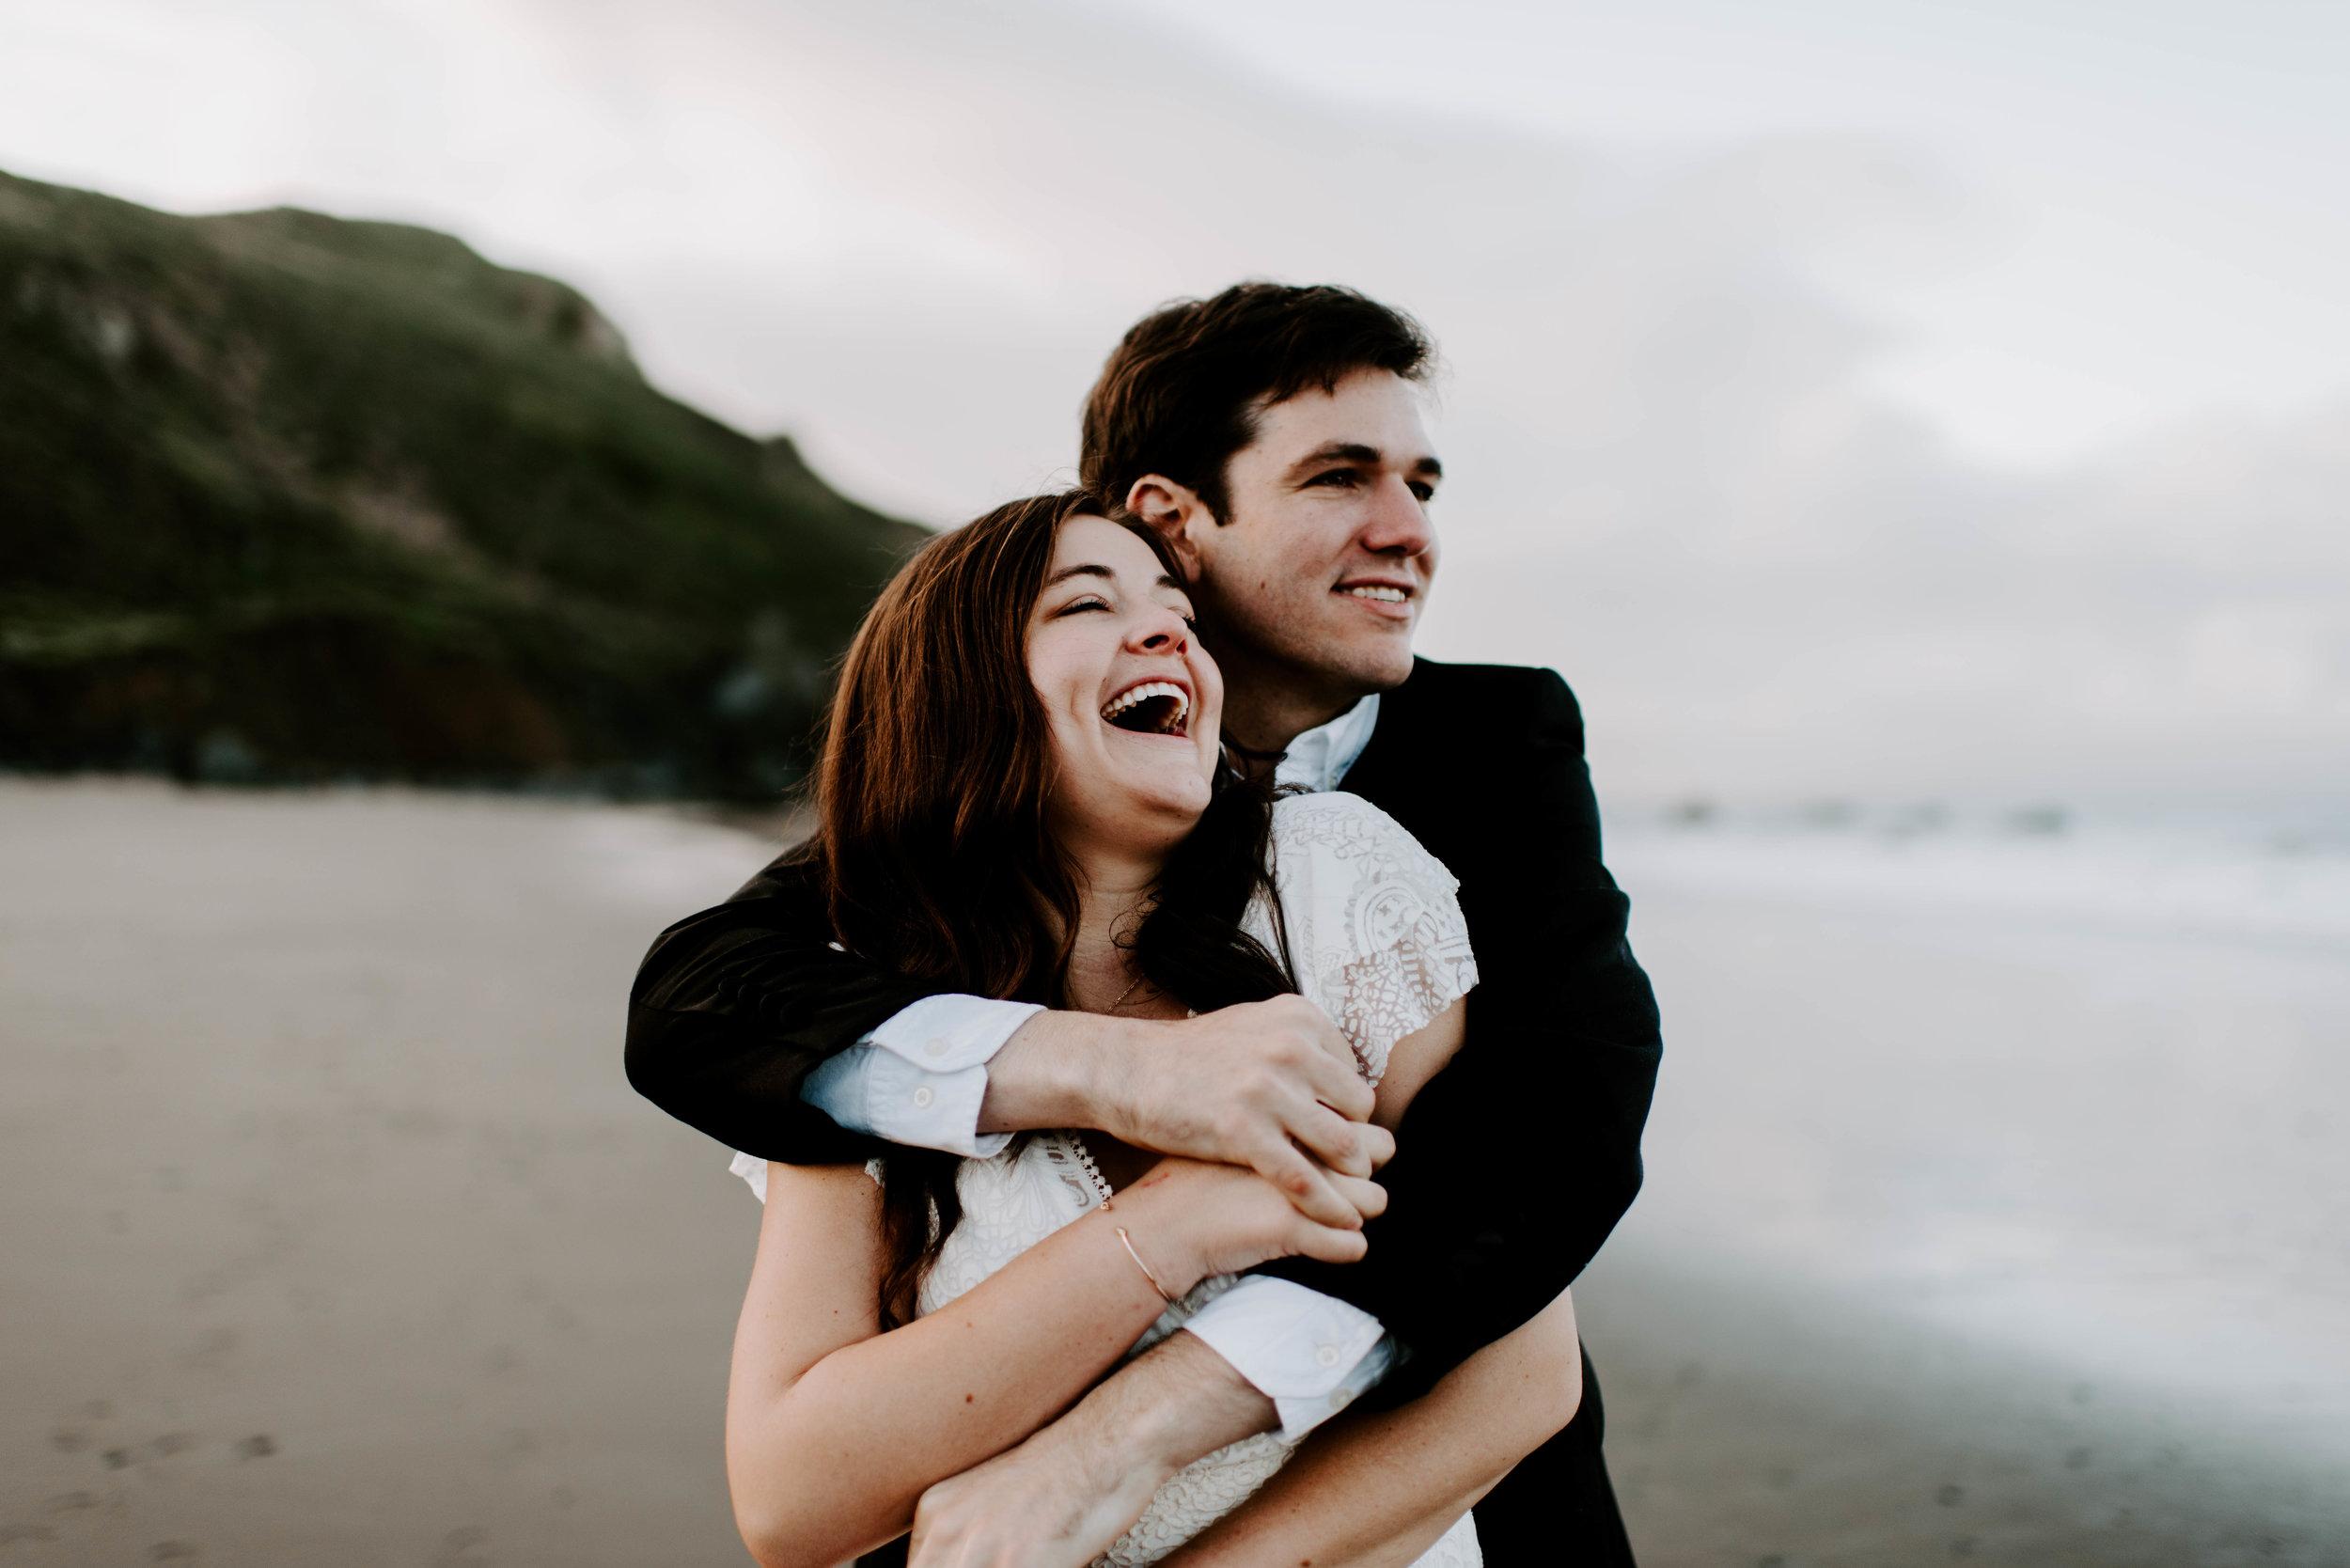 maryandnick_couplessession_cdupont-102.jpg